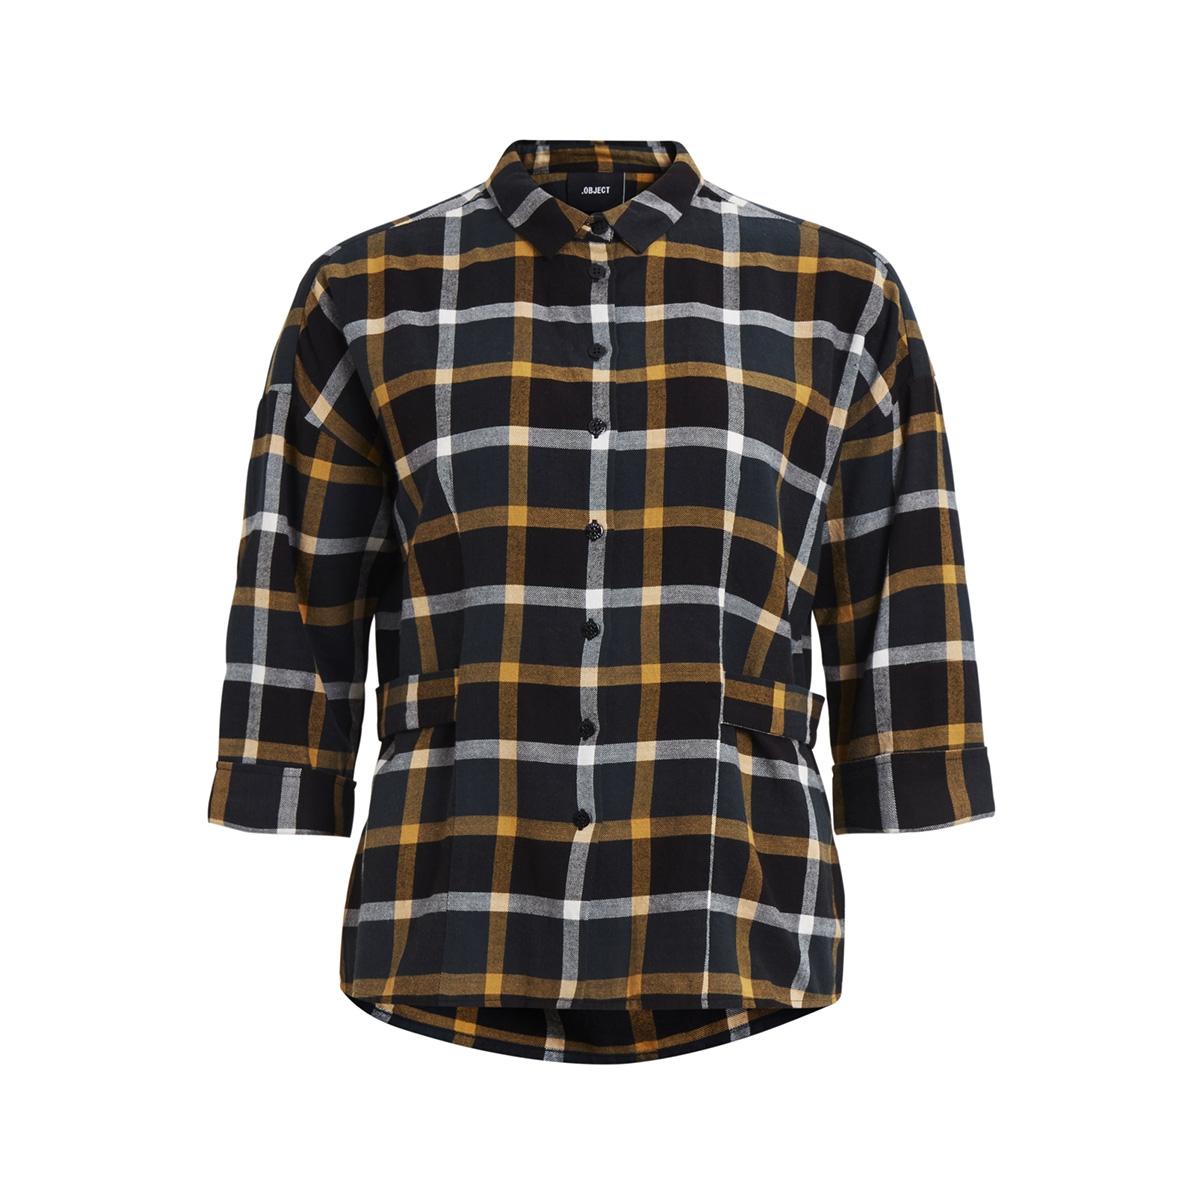 objaubree l/s side button shirt au 23026377 object blouse black